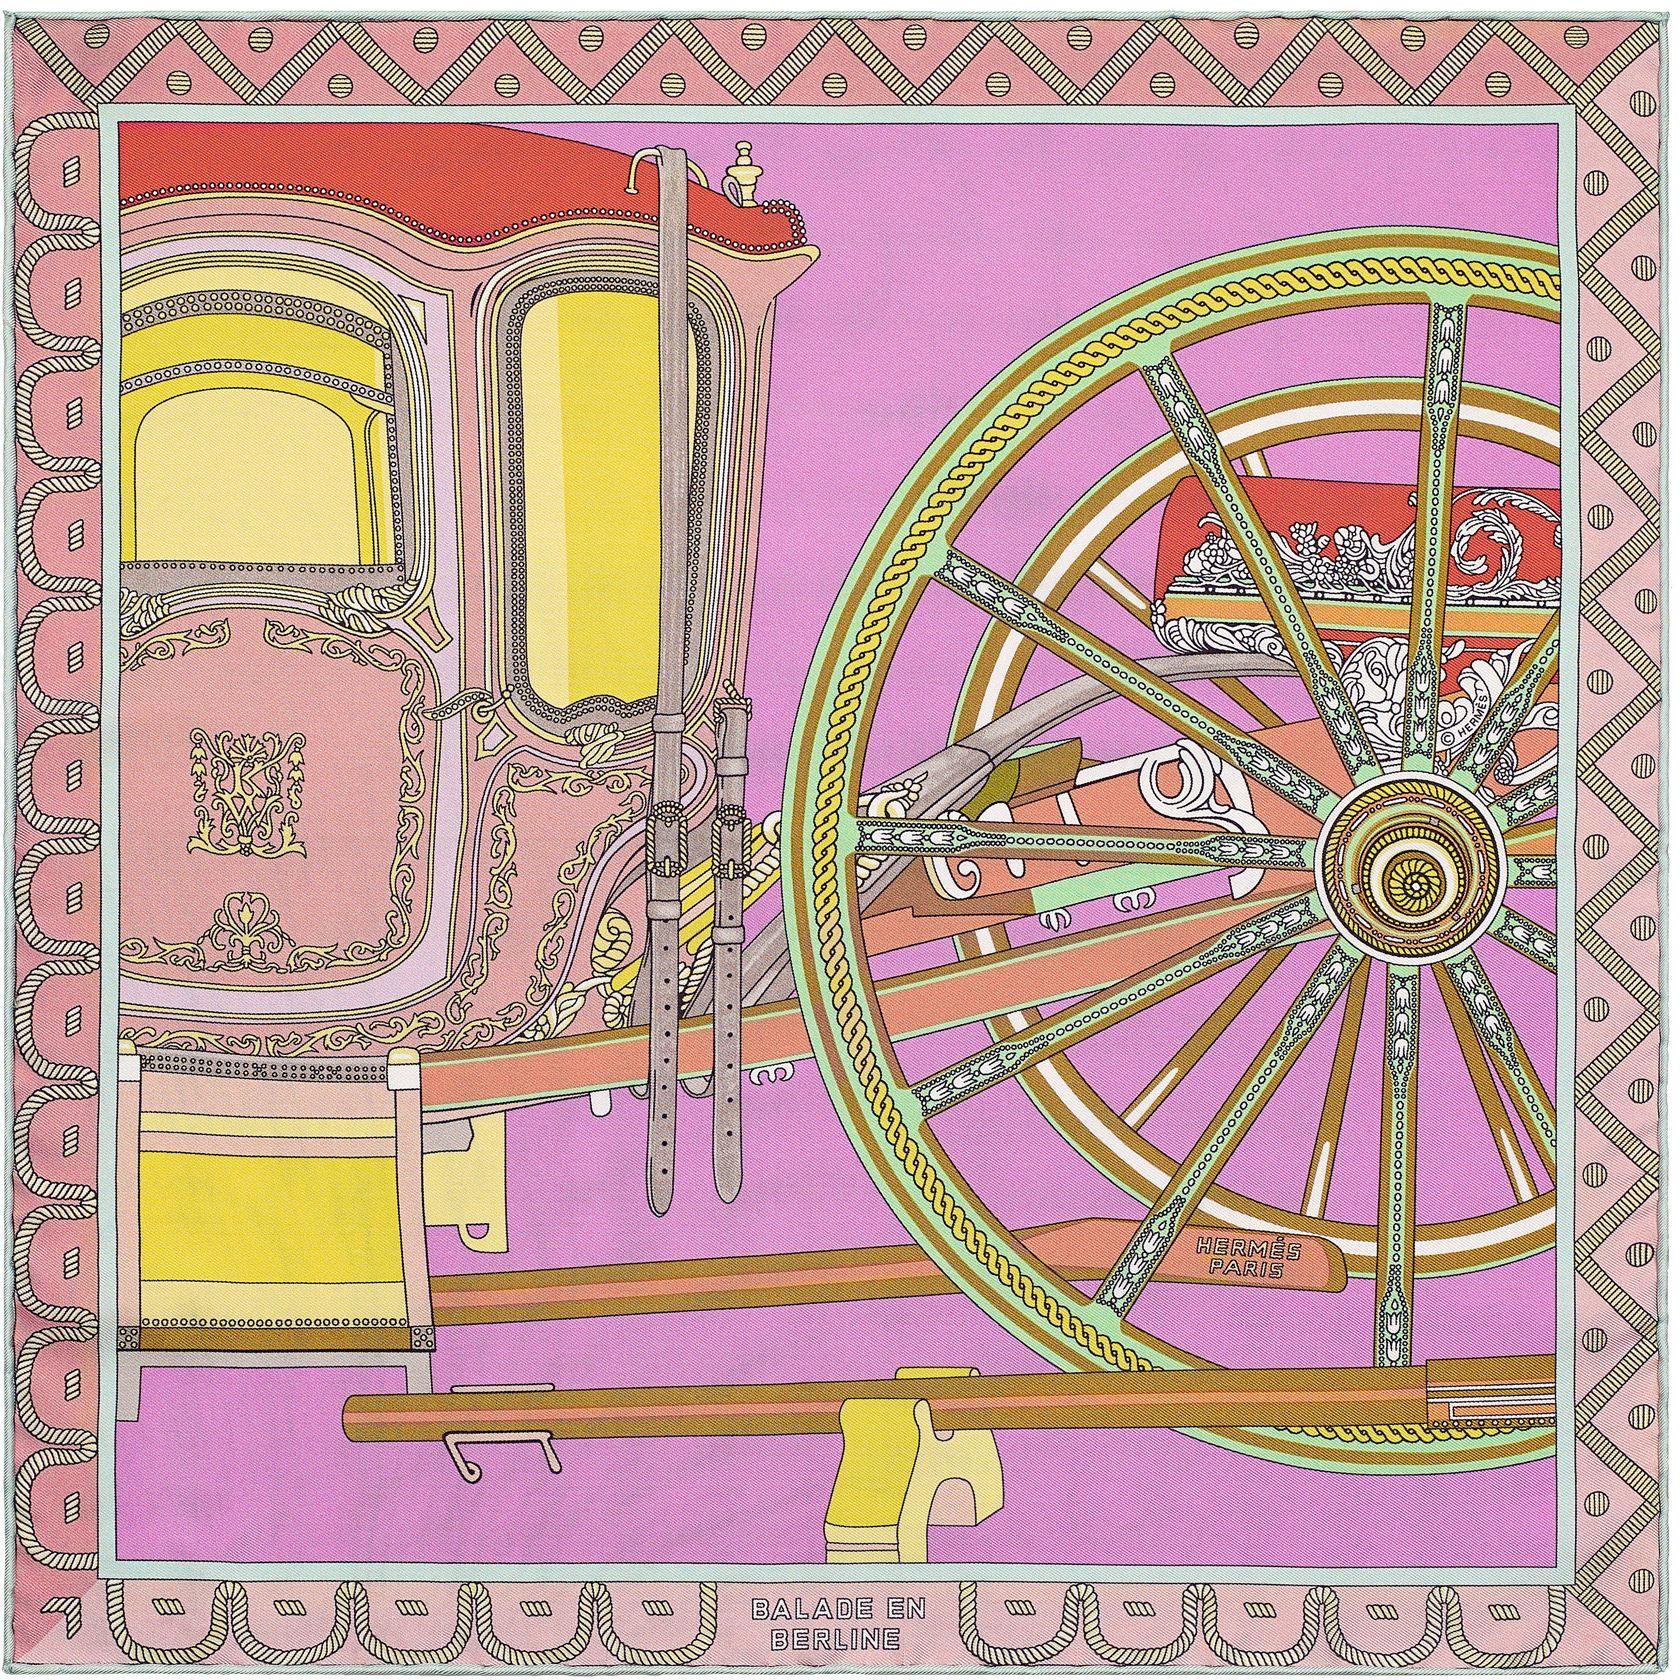 b760d96ea06f Gavroche 45 x 45 cm Hermès   Balade en Berline   Carré Hermès in ...